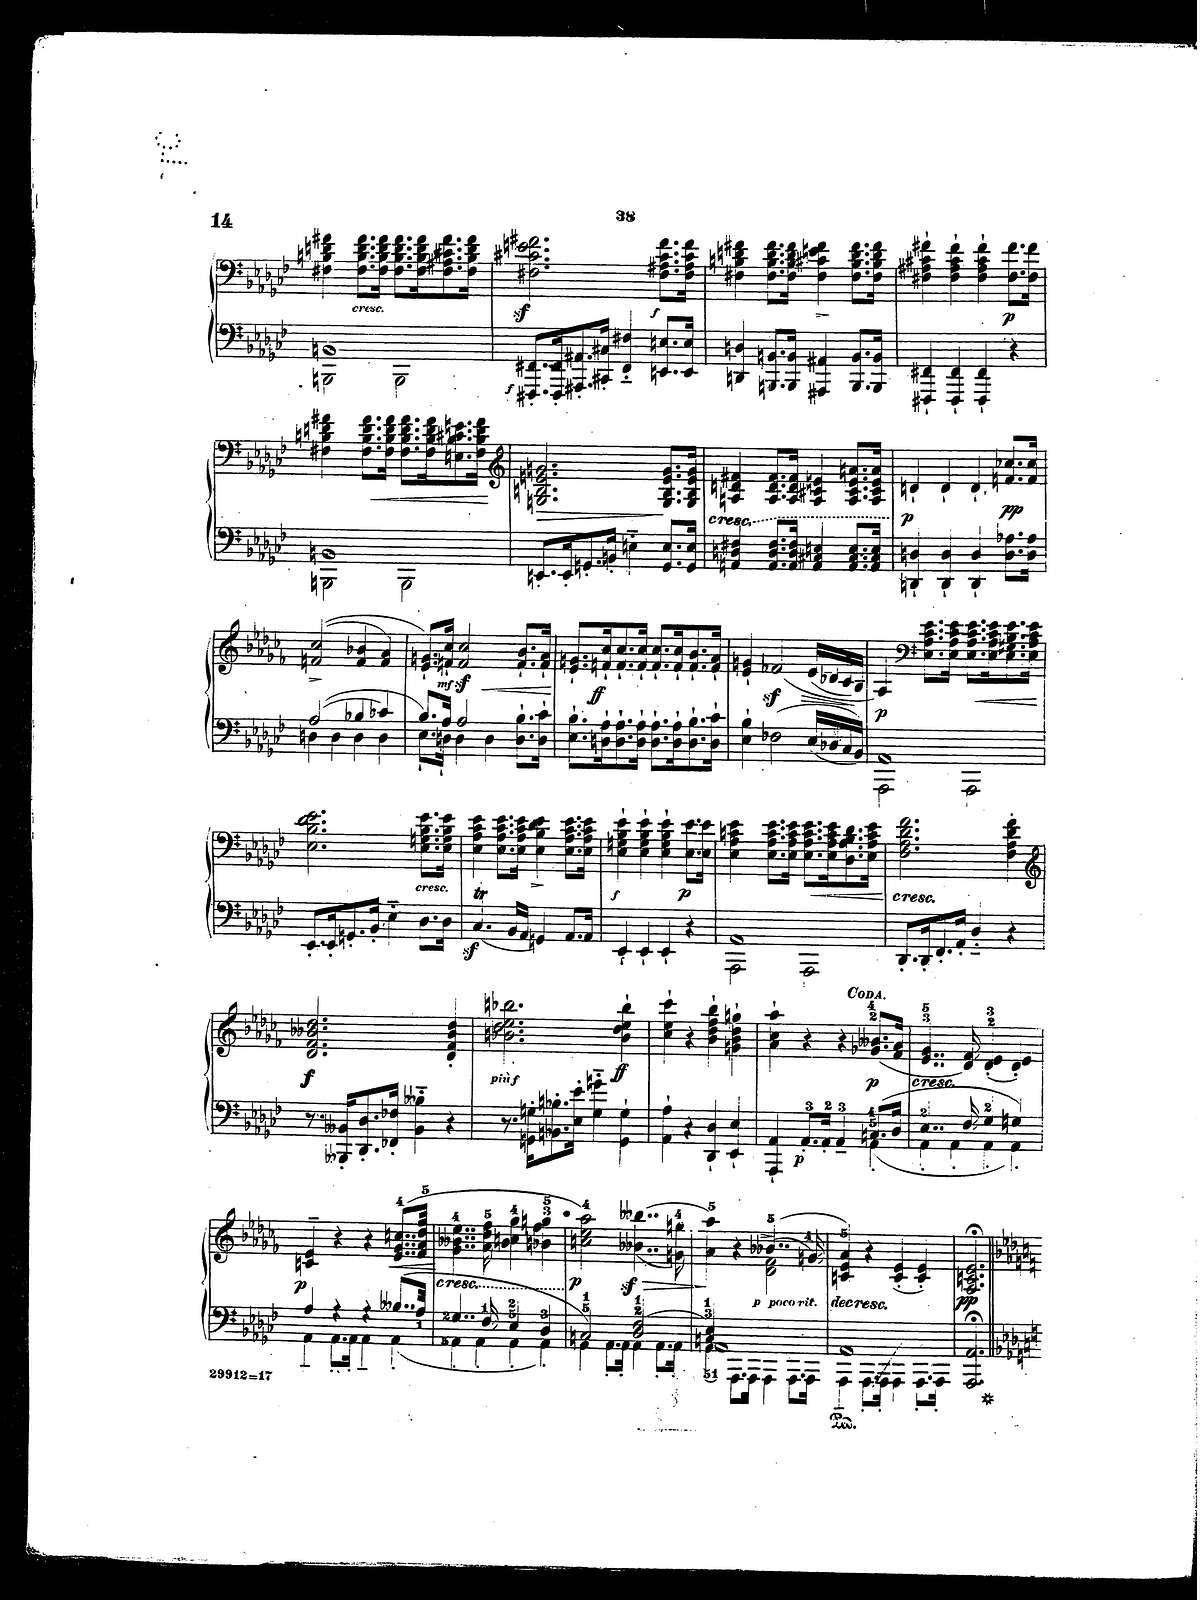 Beethoven's Sonatas, op. 26